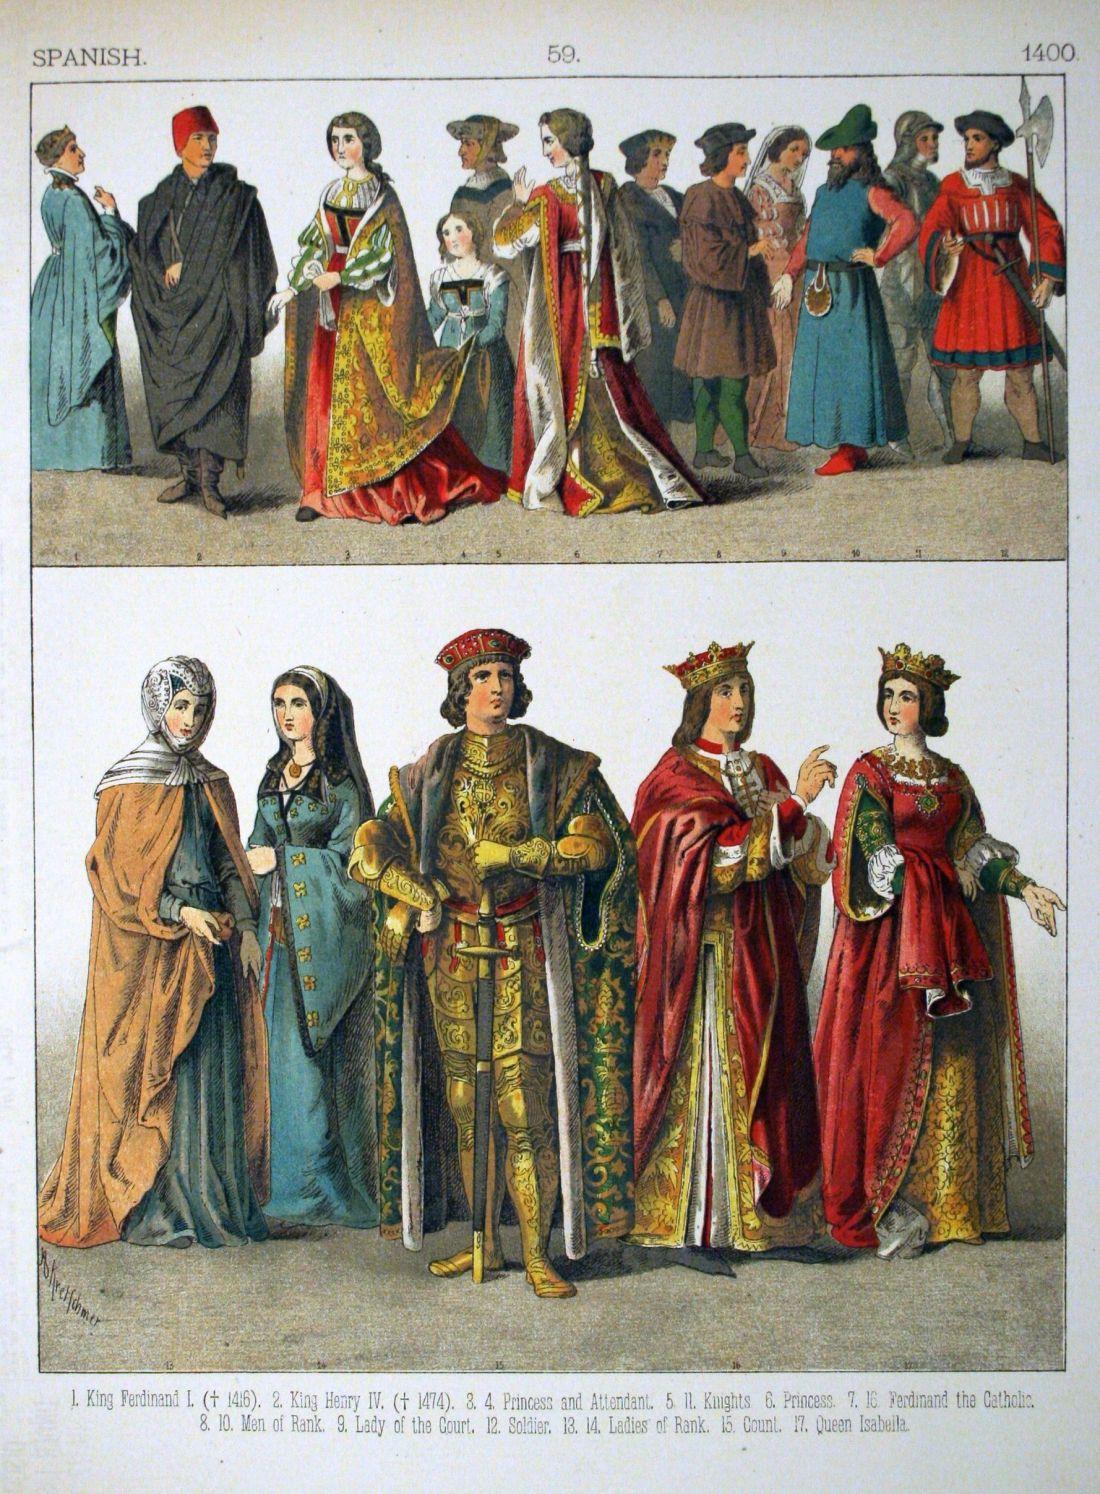 History of costume description 1400 spanish 059